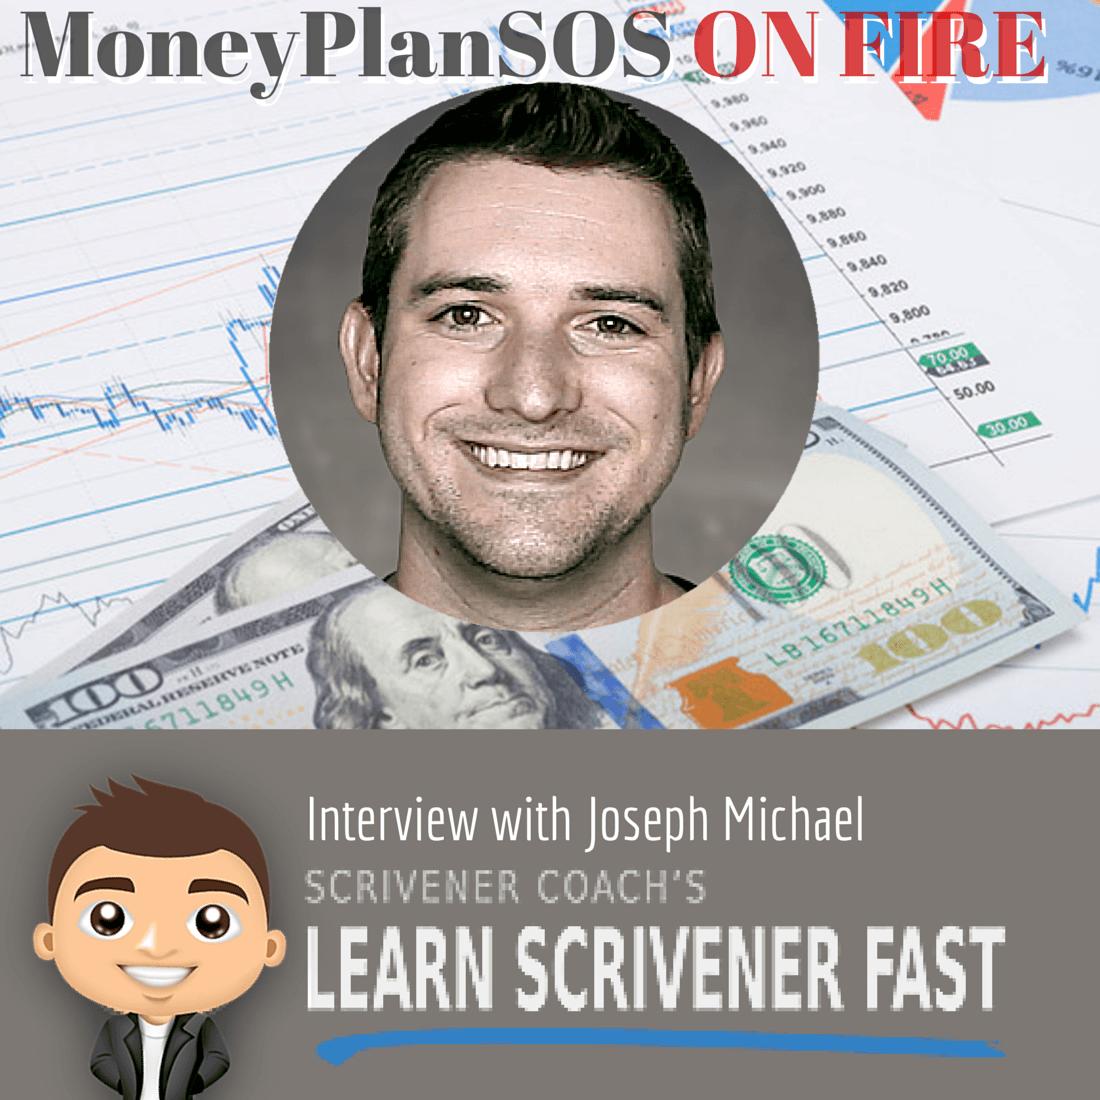 Money Plan SOS ON FIRE with Joseph Michael